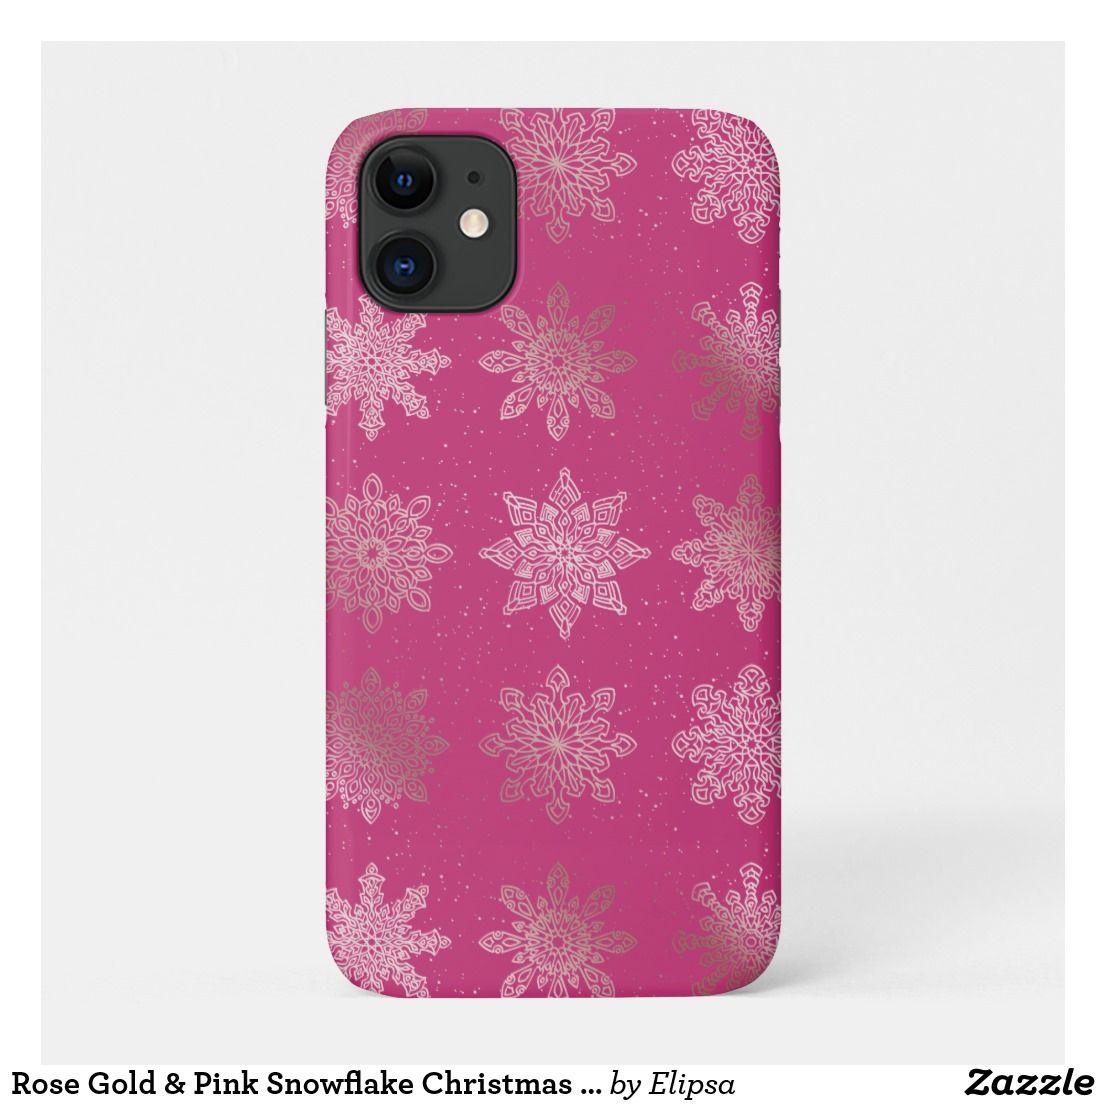 Rose Gold & Pink Snowflake Christmas Pattern CaseMate